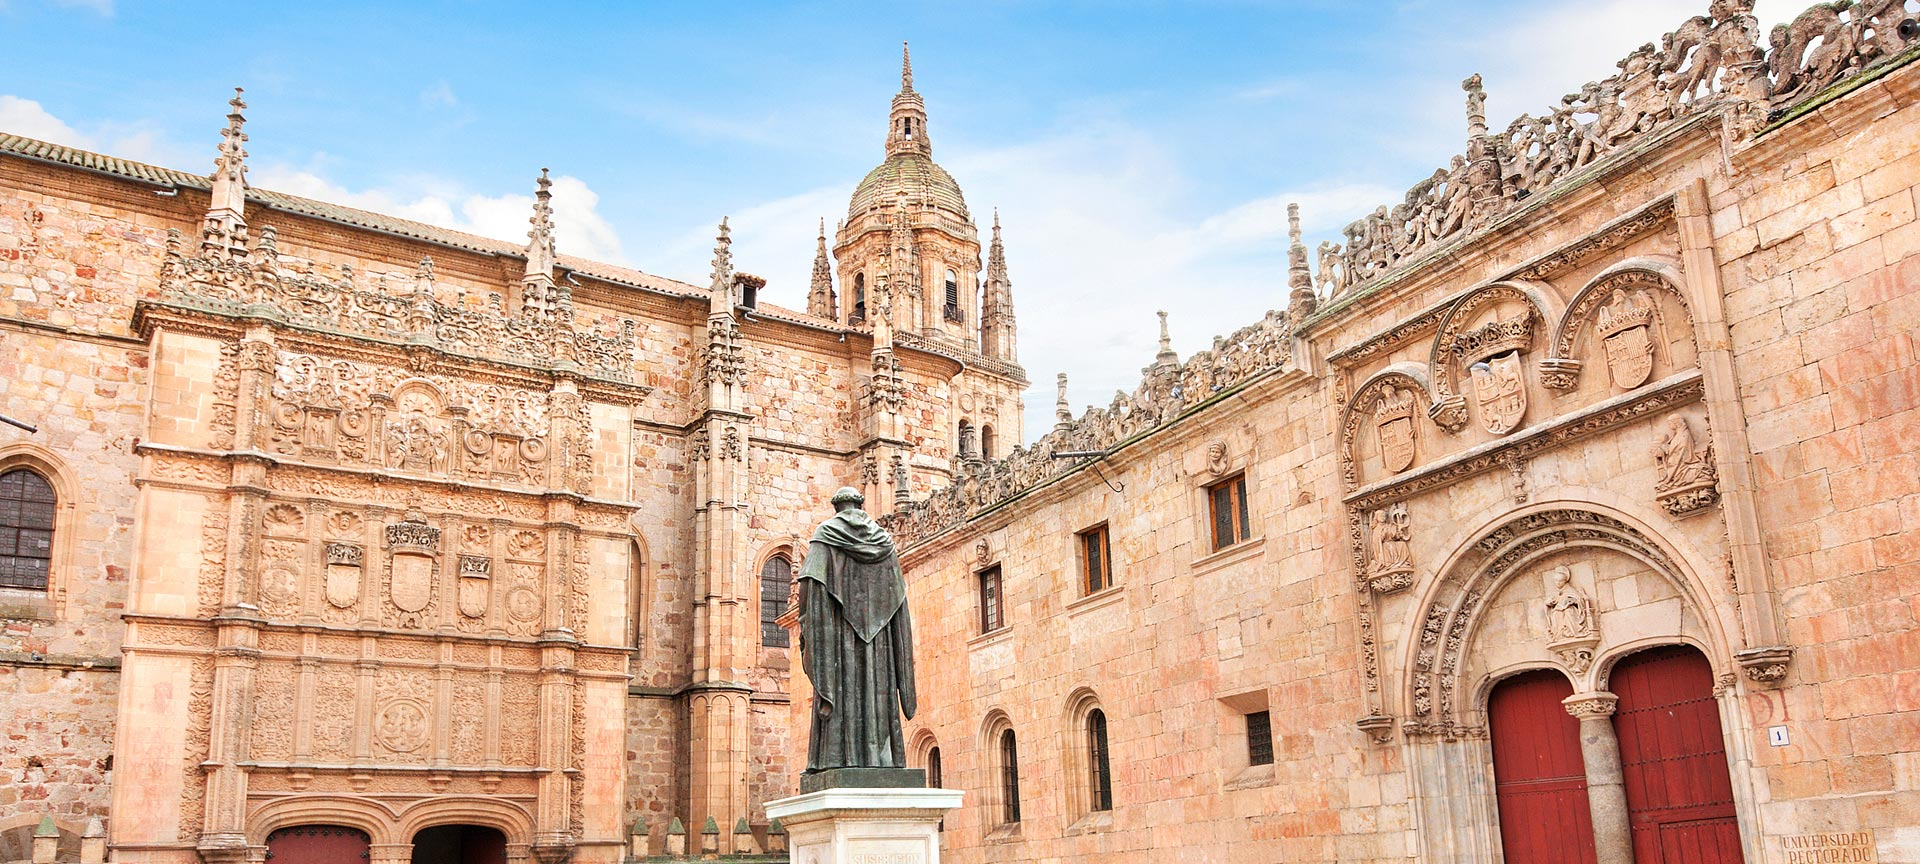 https://www.spain.info/export/sites/segtur/.content/images/cabeceras-grandes/castilla-leon/universidad-salamanca-s131185496.jpg_604889389.jpg